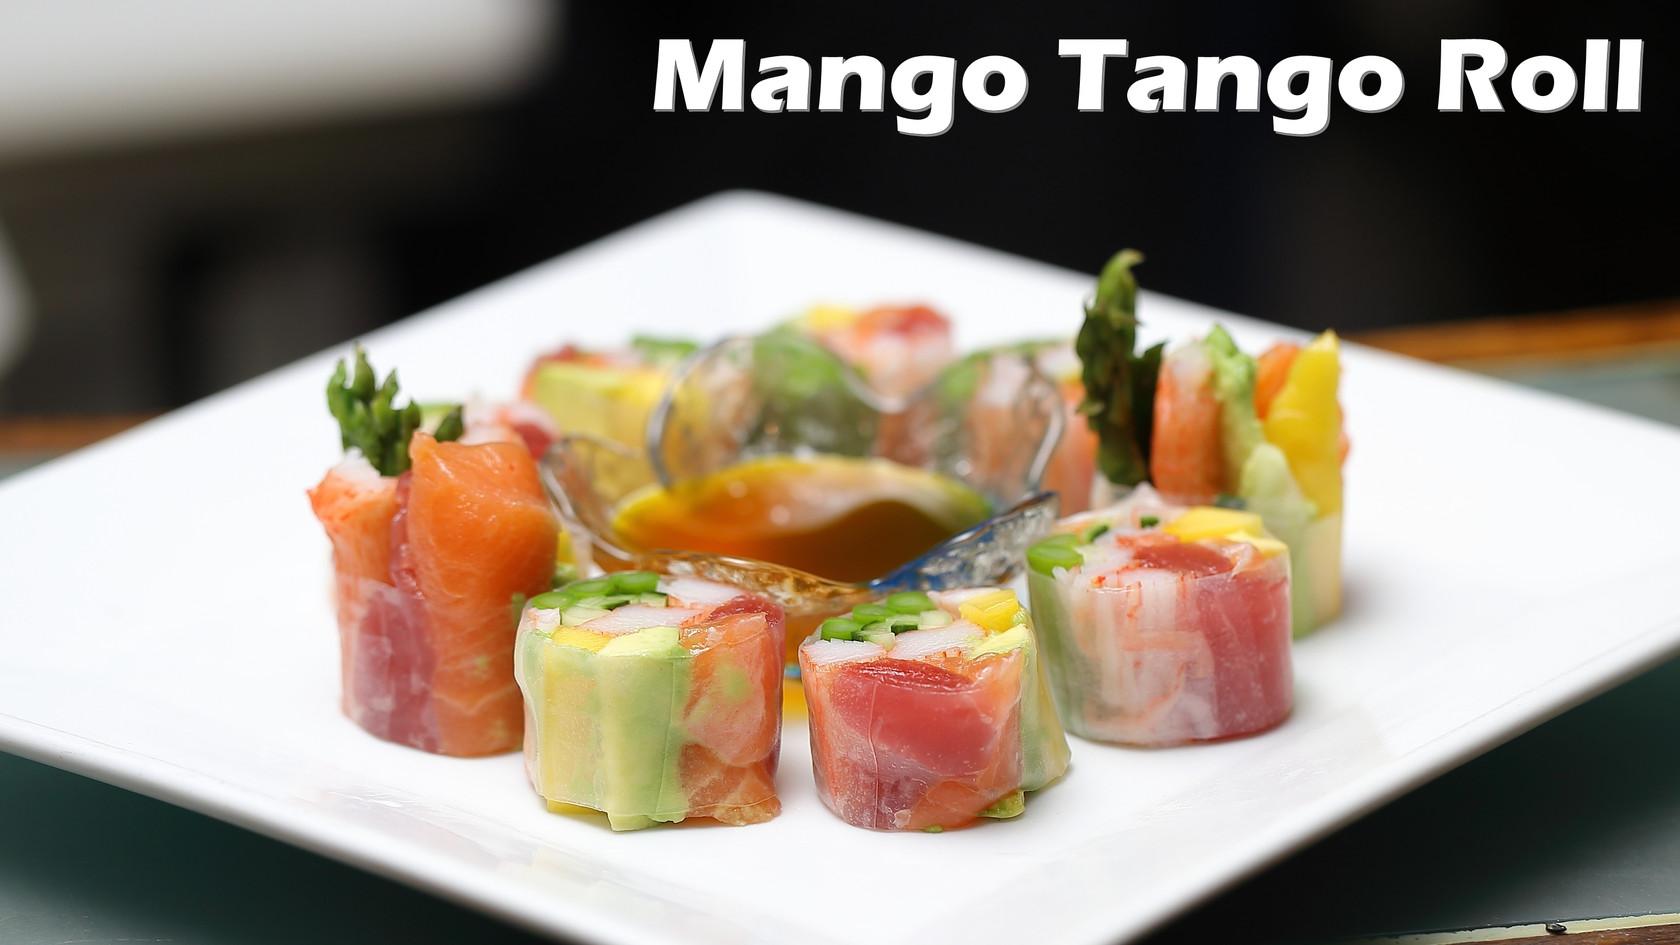 Mango Tango Roll 06.JPG